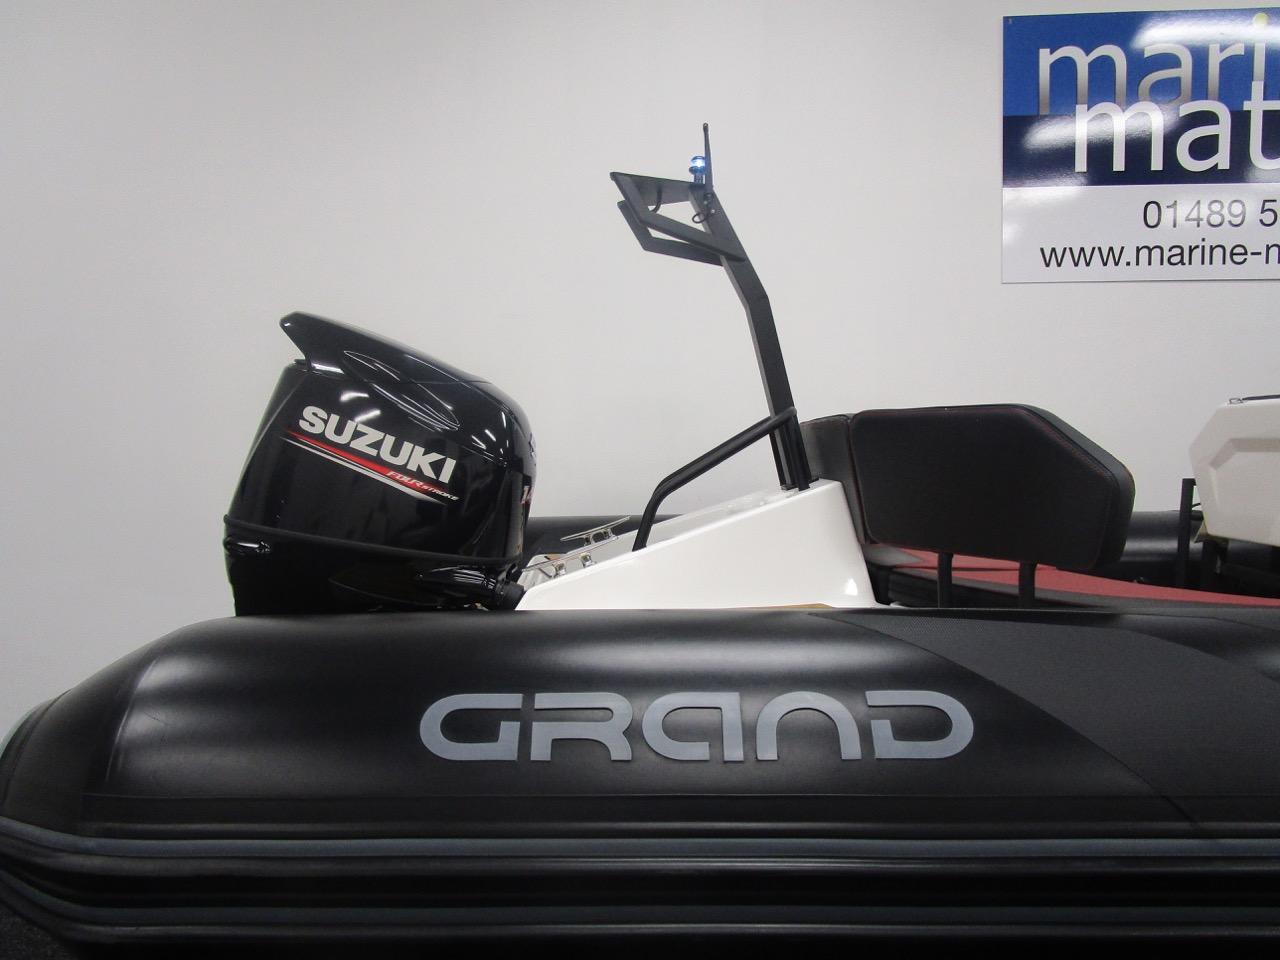 GRAND DRIVE D600 RIB rear section